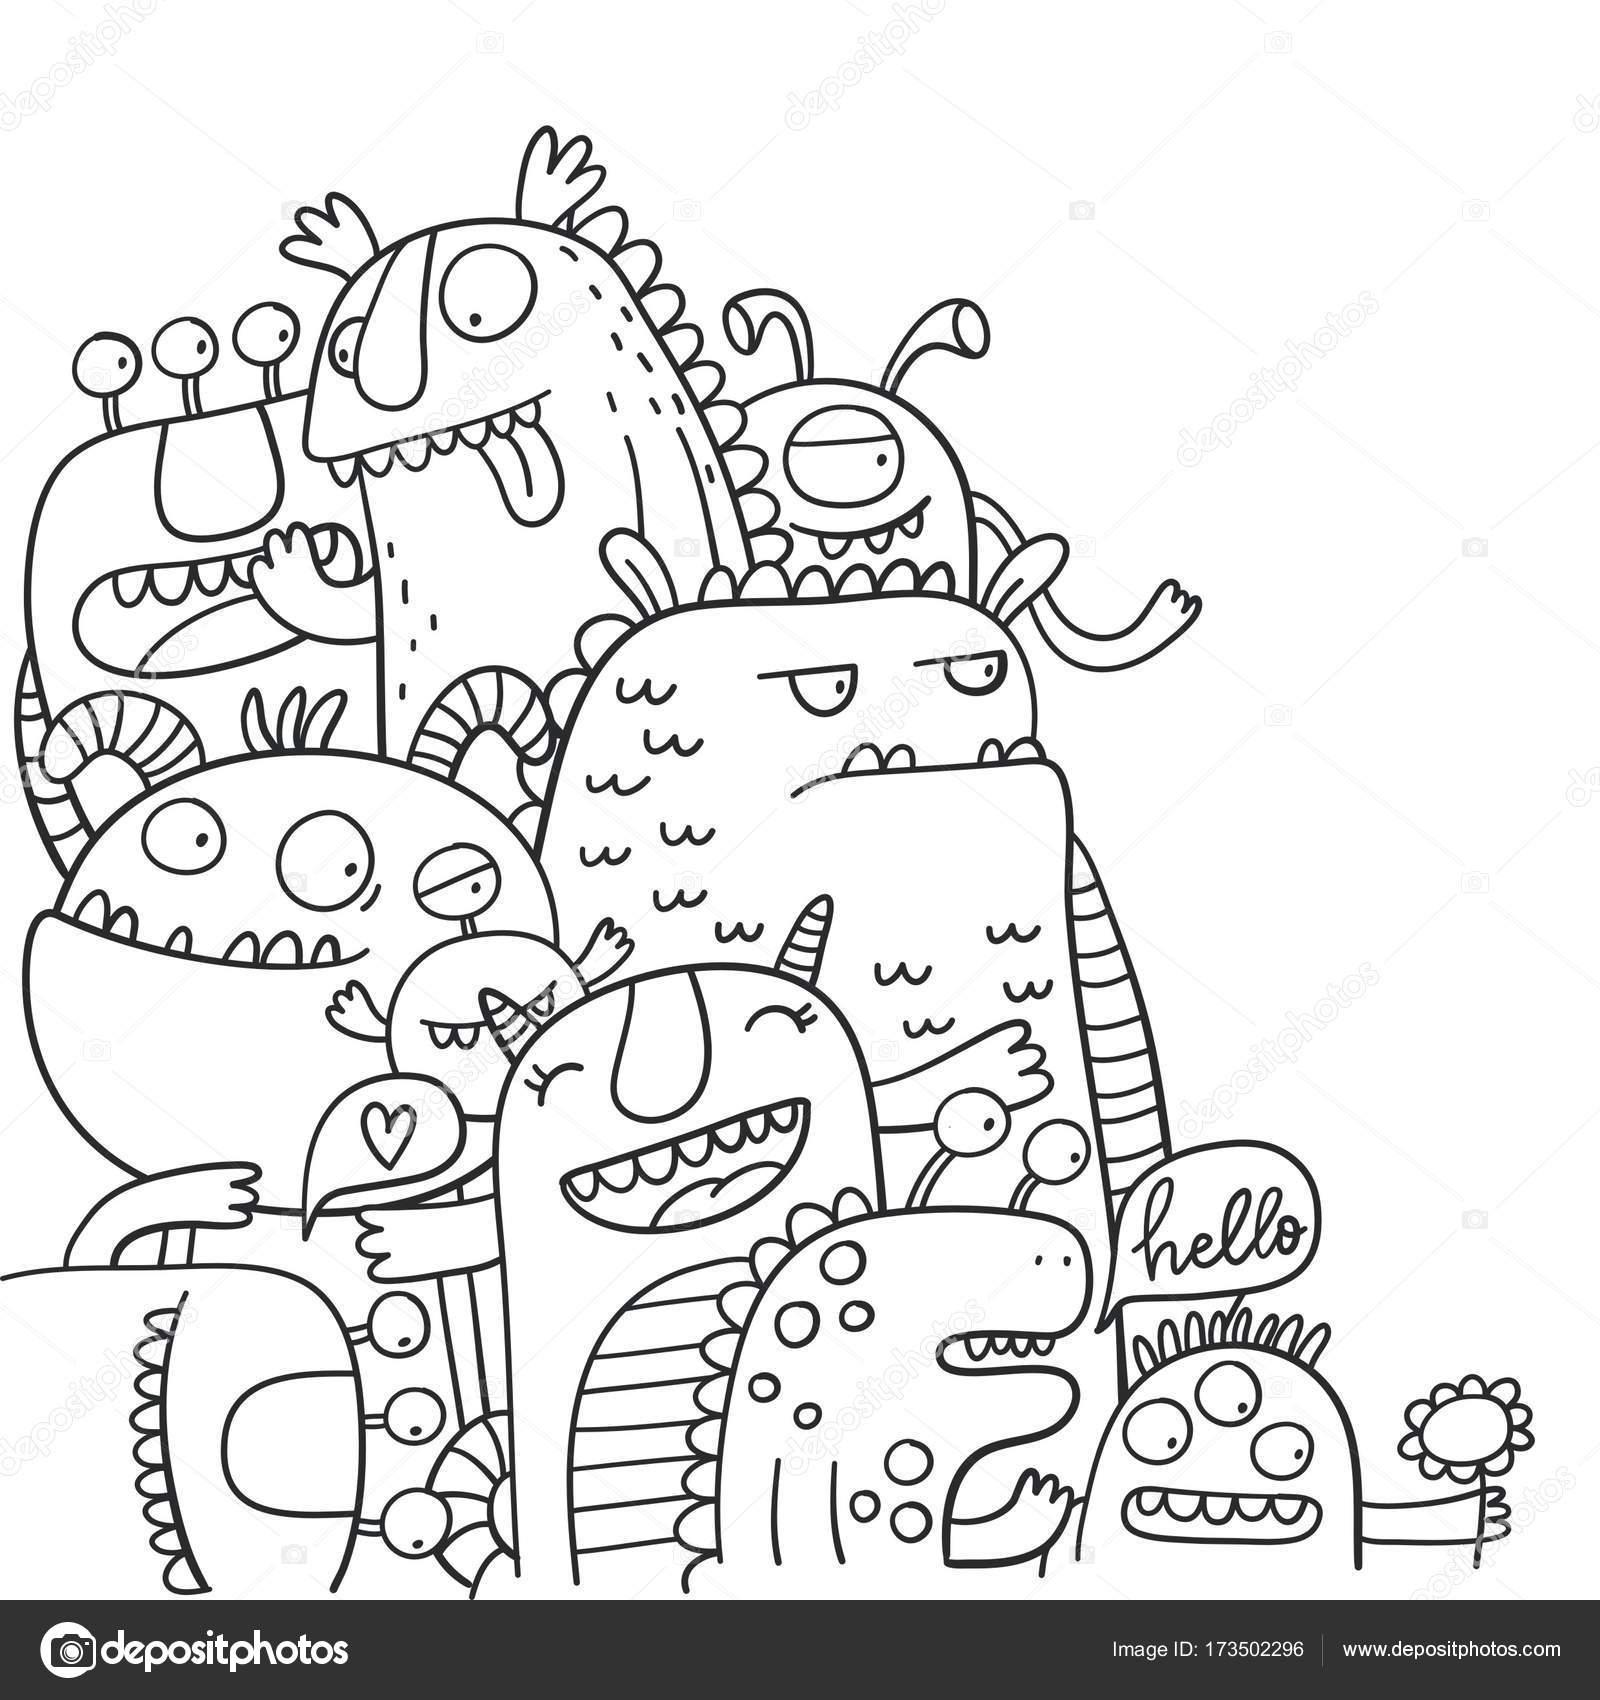 Süße Monster Malvorlagen — Stockvektor © Webmuza #173502296